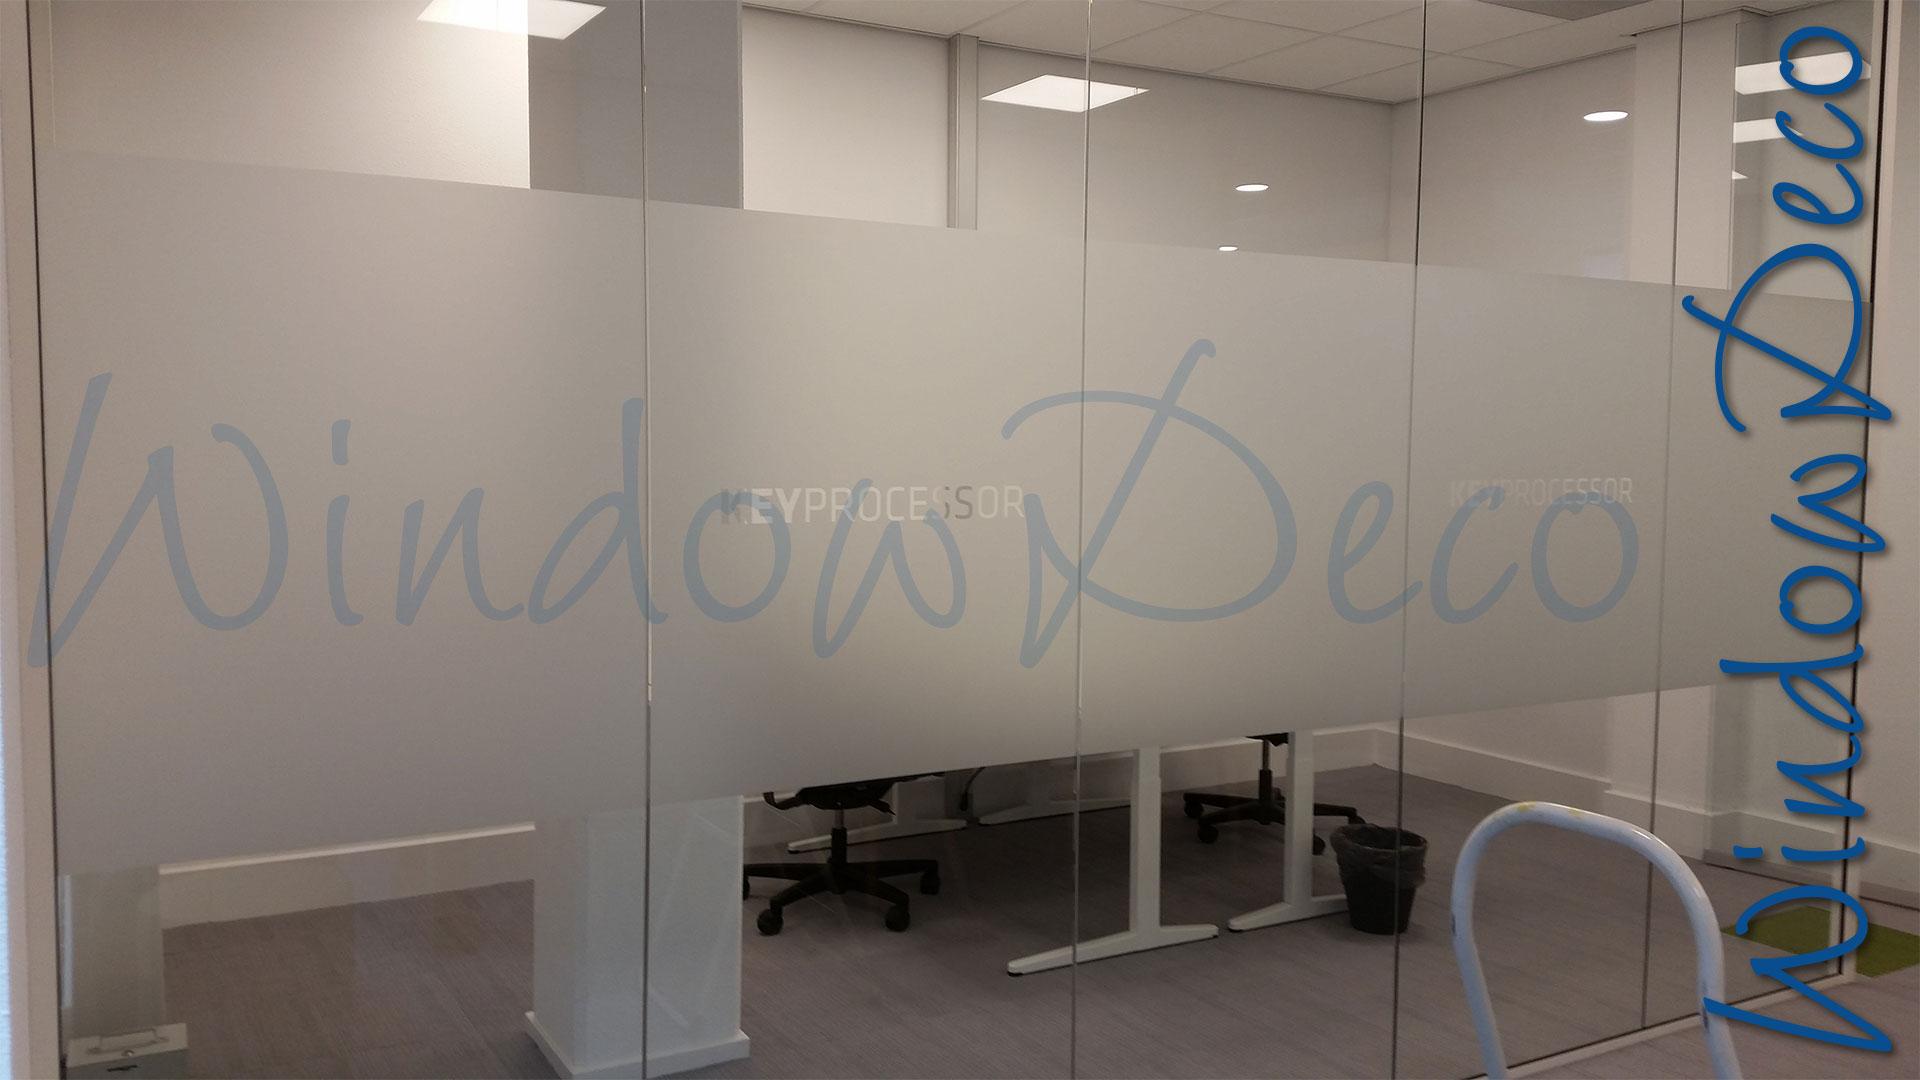 Kantoor met raamfolie, glasfolie met logo, anti inkijk, windowdeco